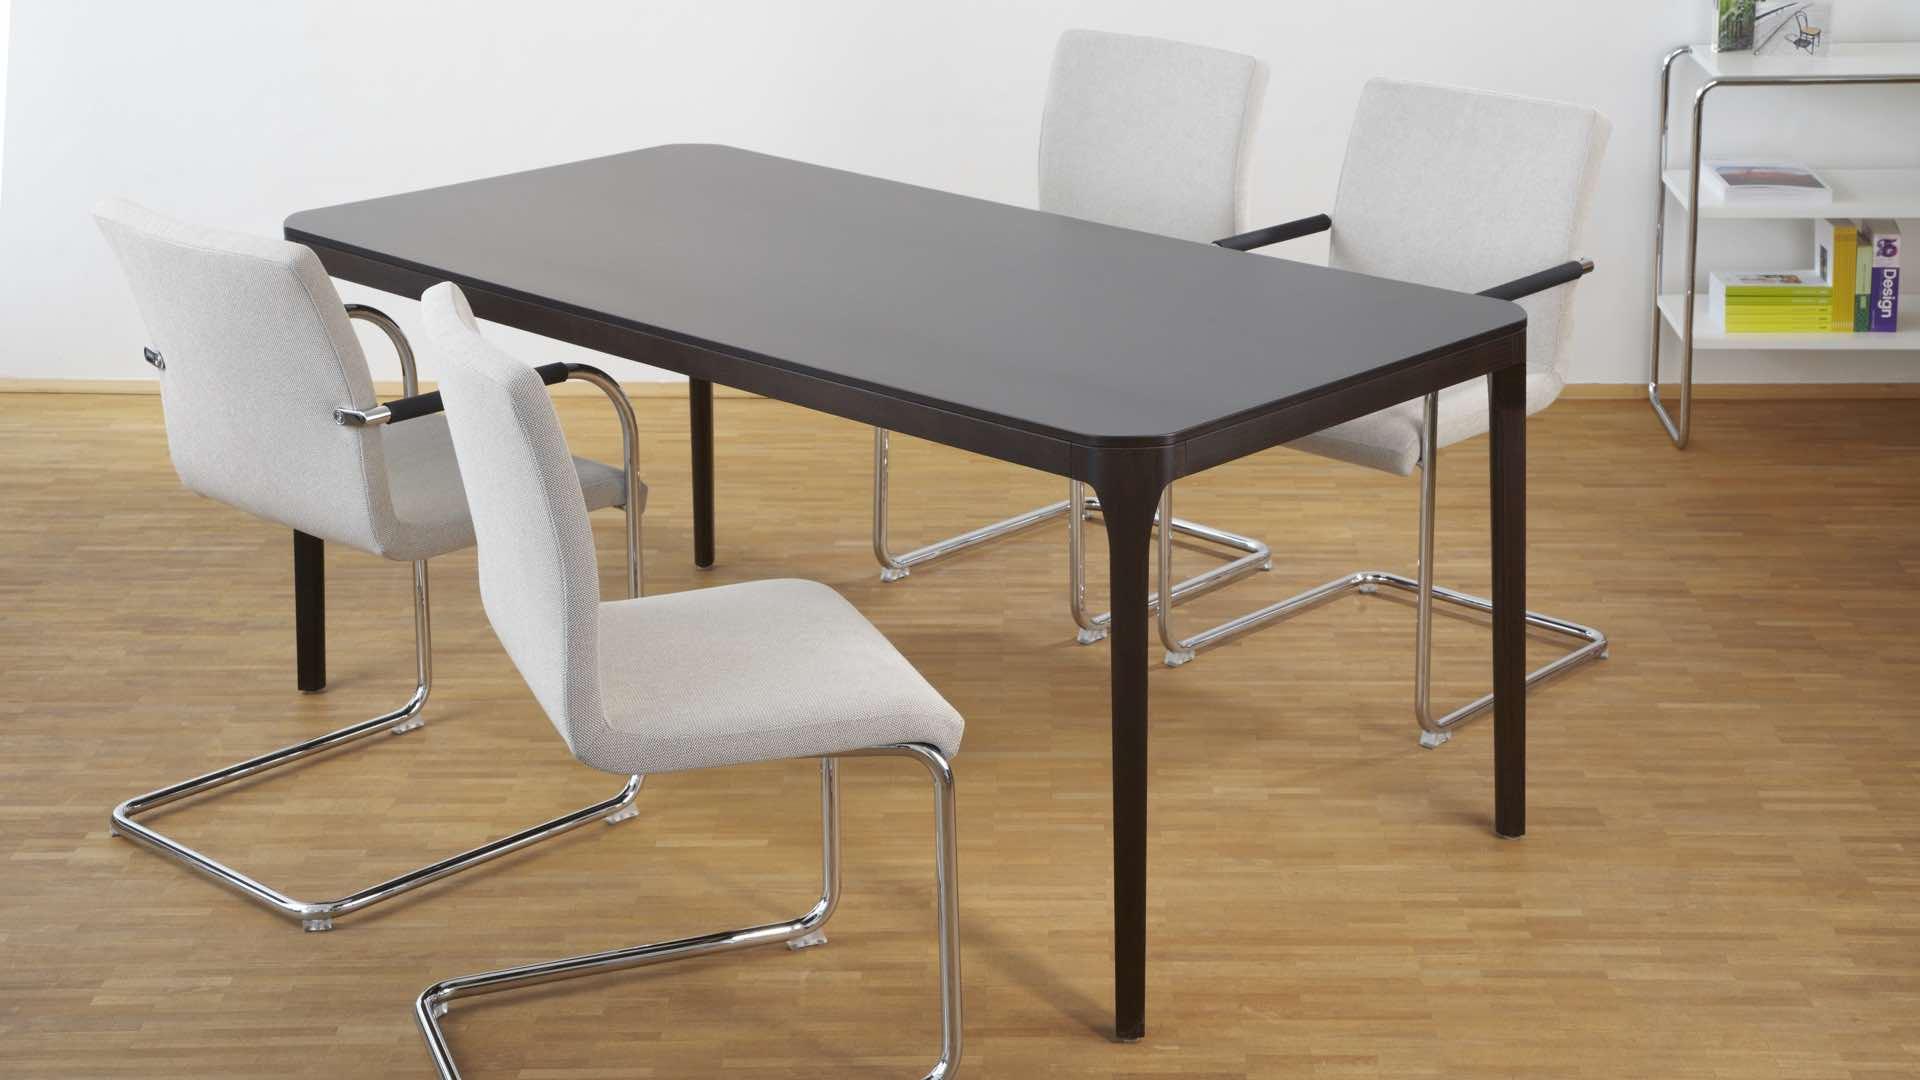 thonetshop thonet s 55 pvfdrw drehstuhl mit rollen. Black Bedroom Furniture Sets. Home Design Ideas